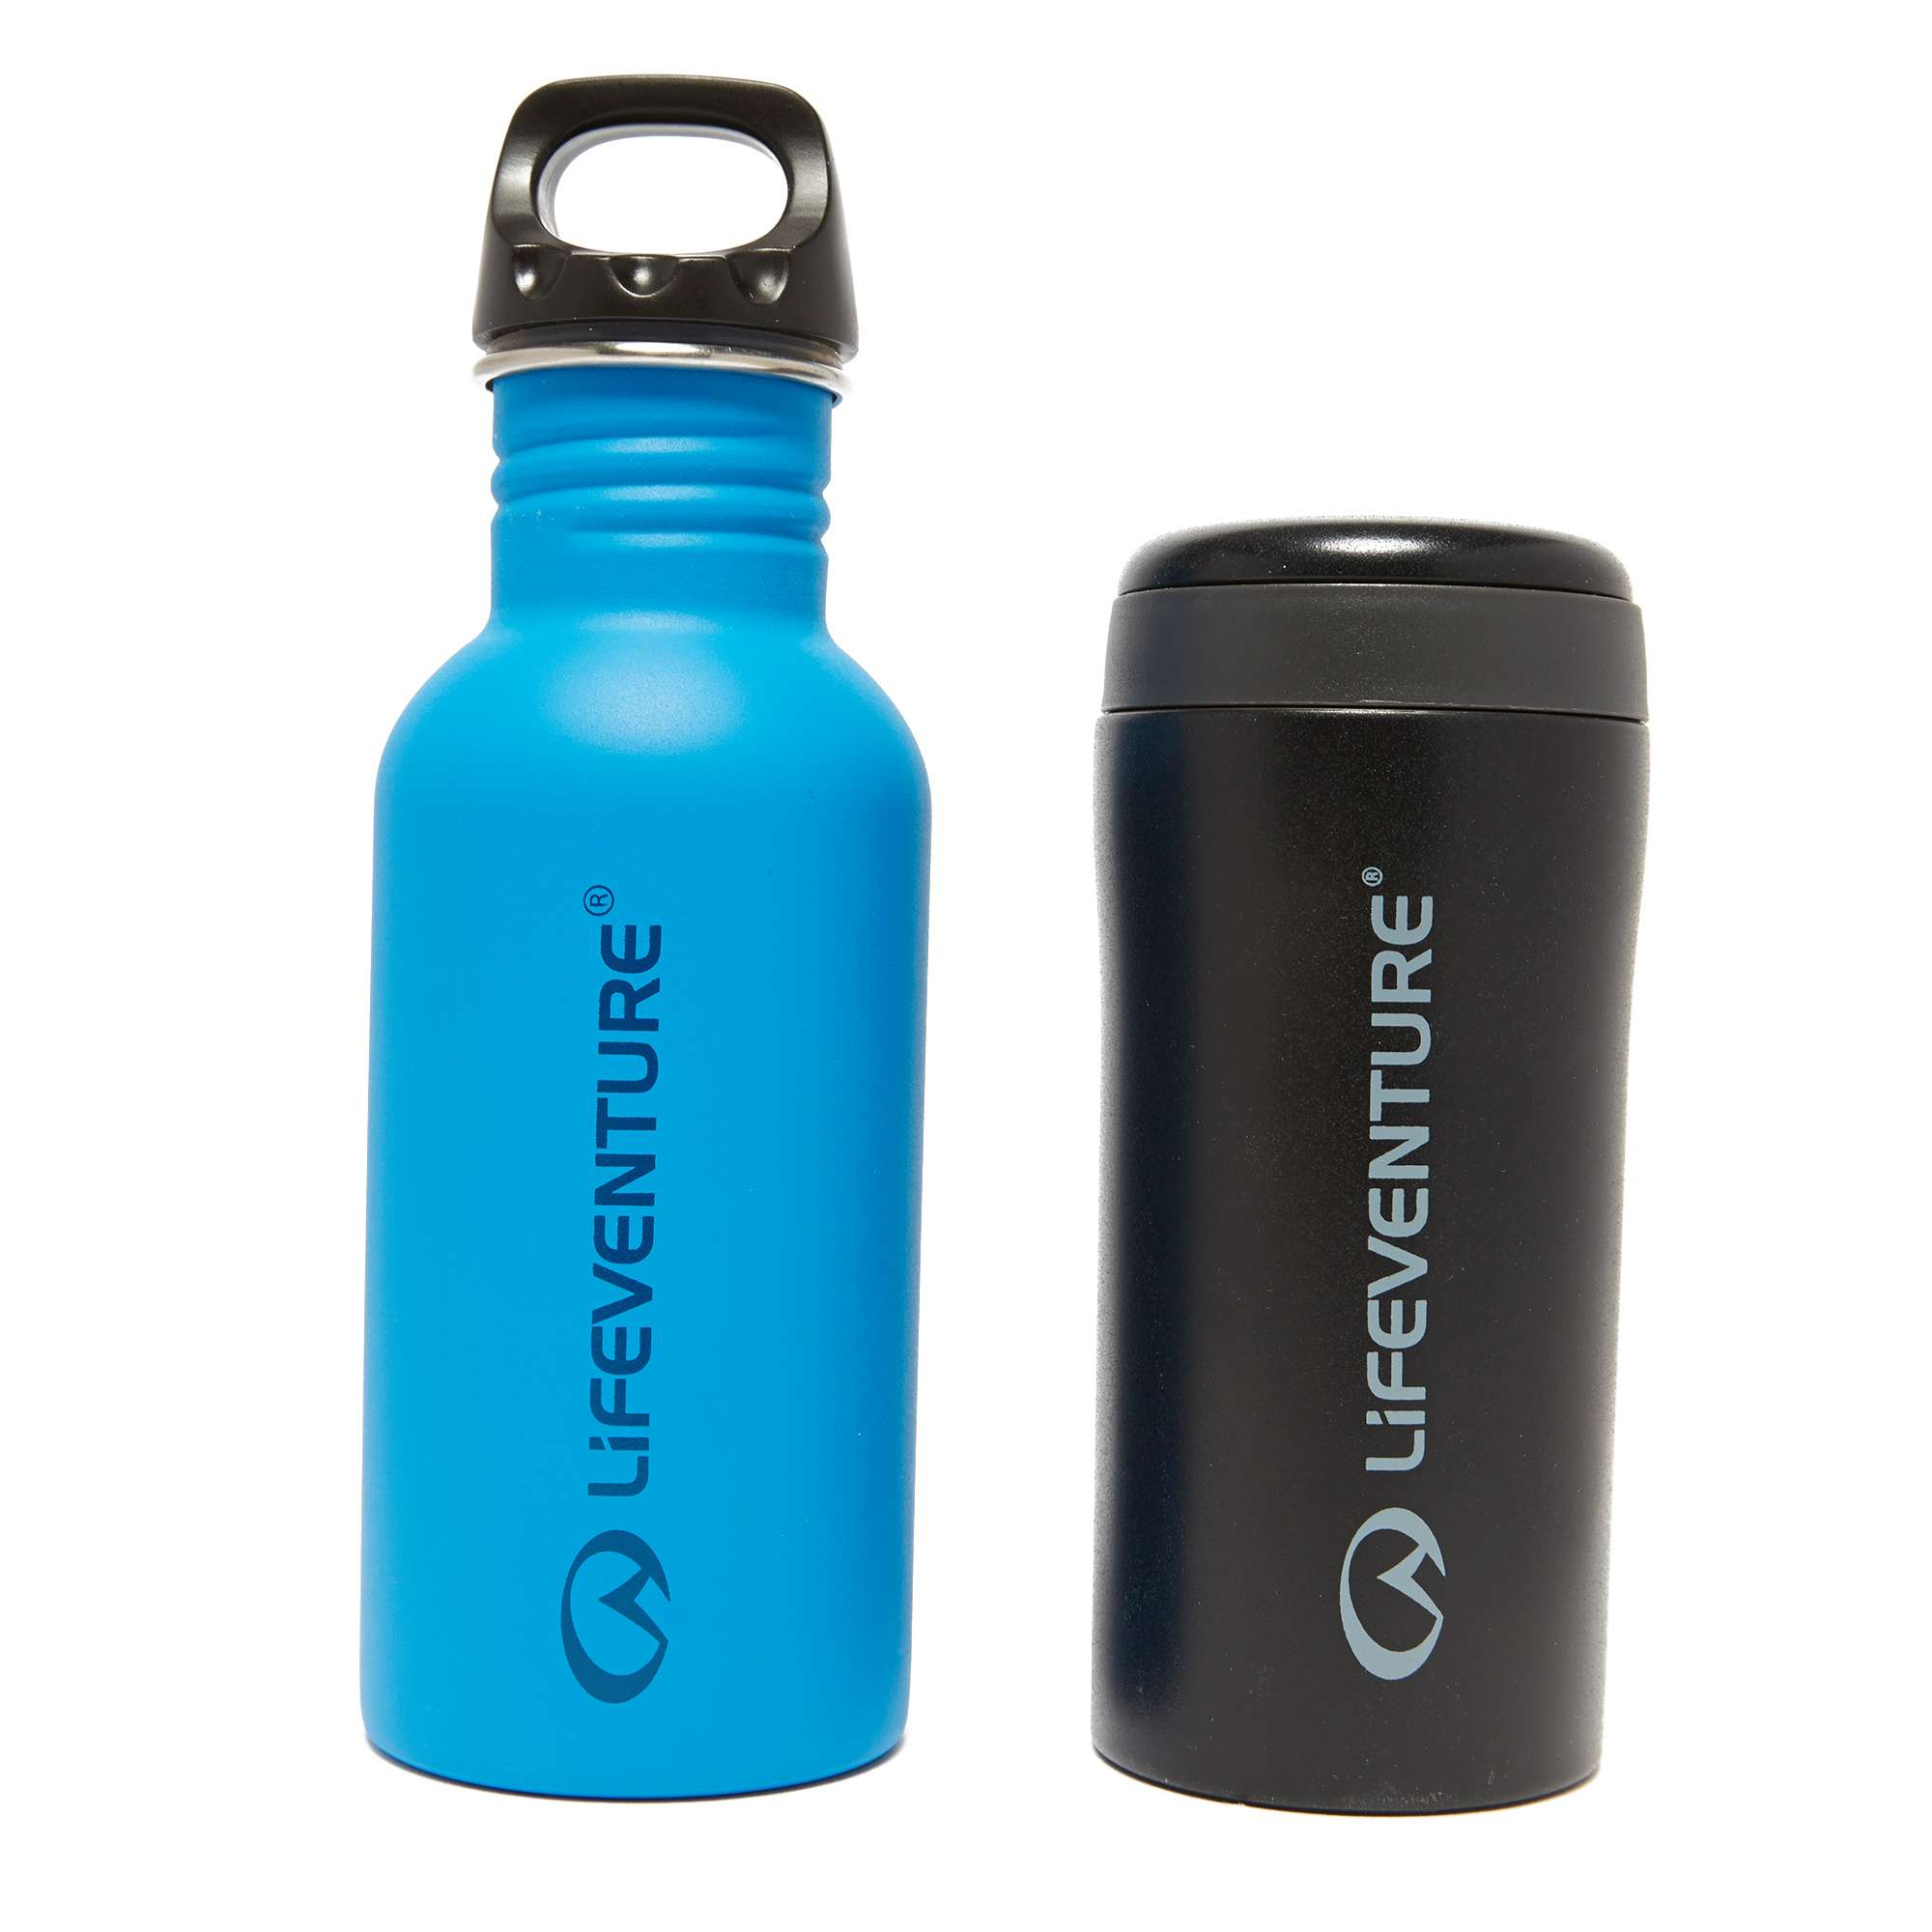 LIFEVENTURE Thermal Mug and Bottle